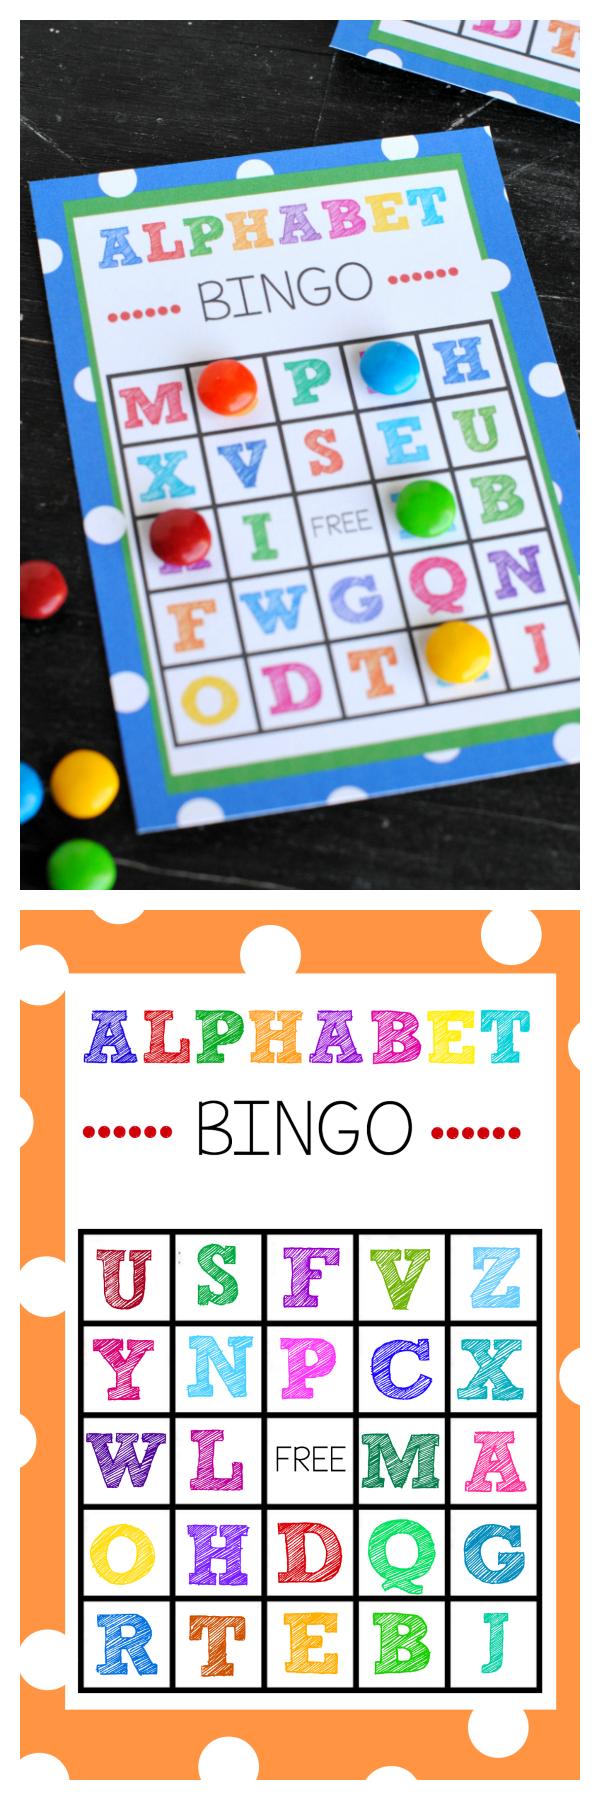 Game Bingo